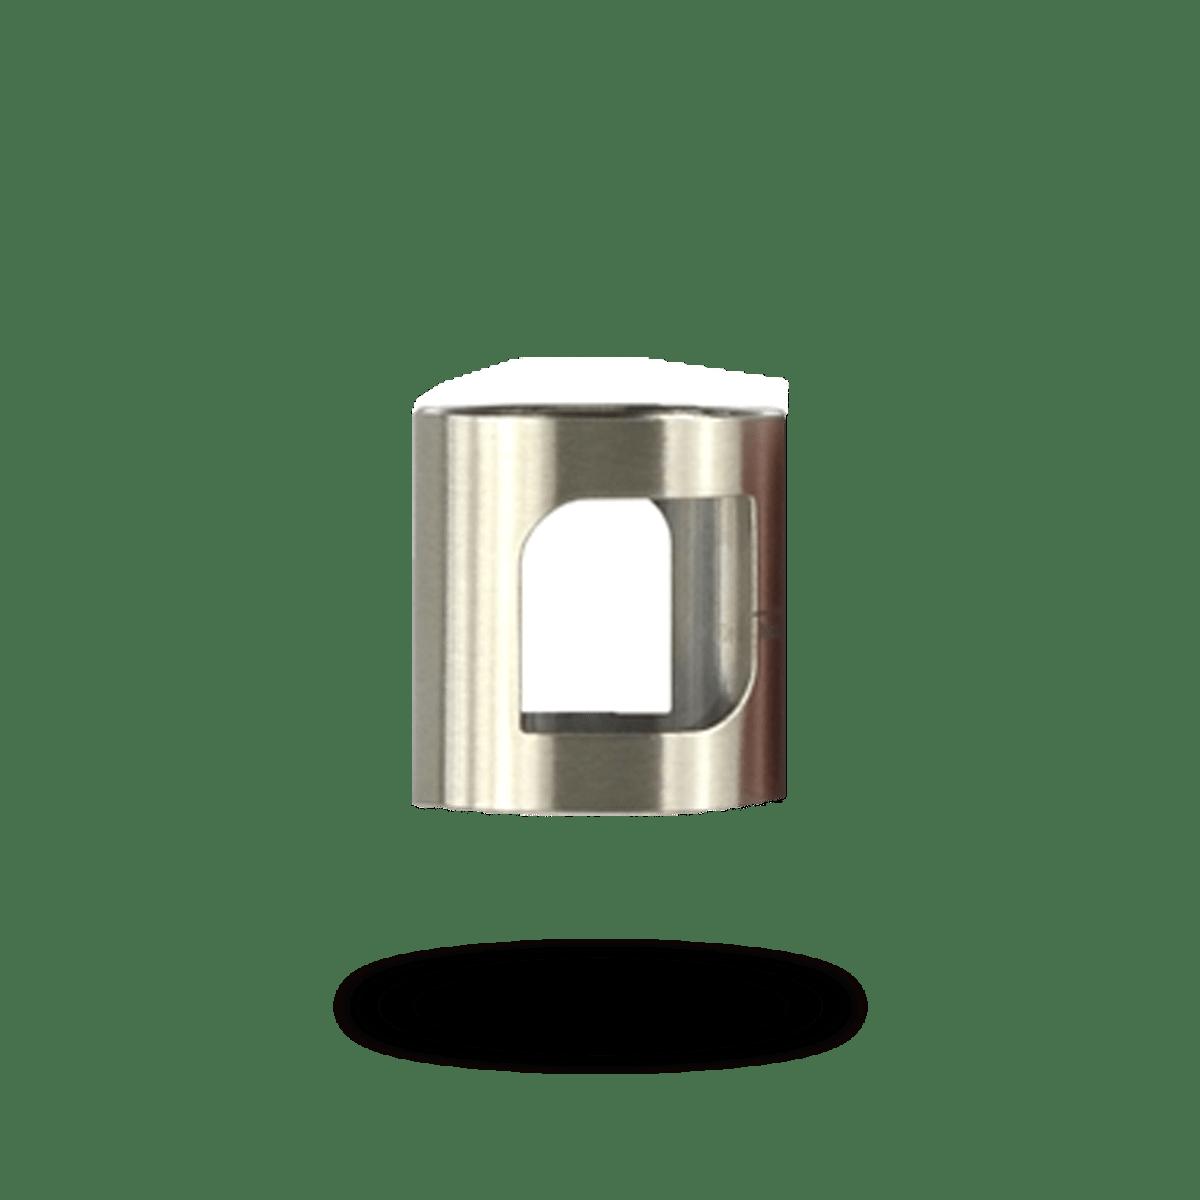 Aspire PockeX AIO Pyrex Tube Silver